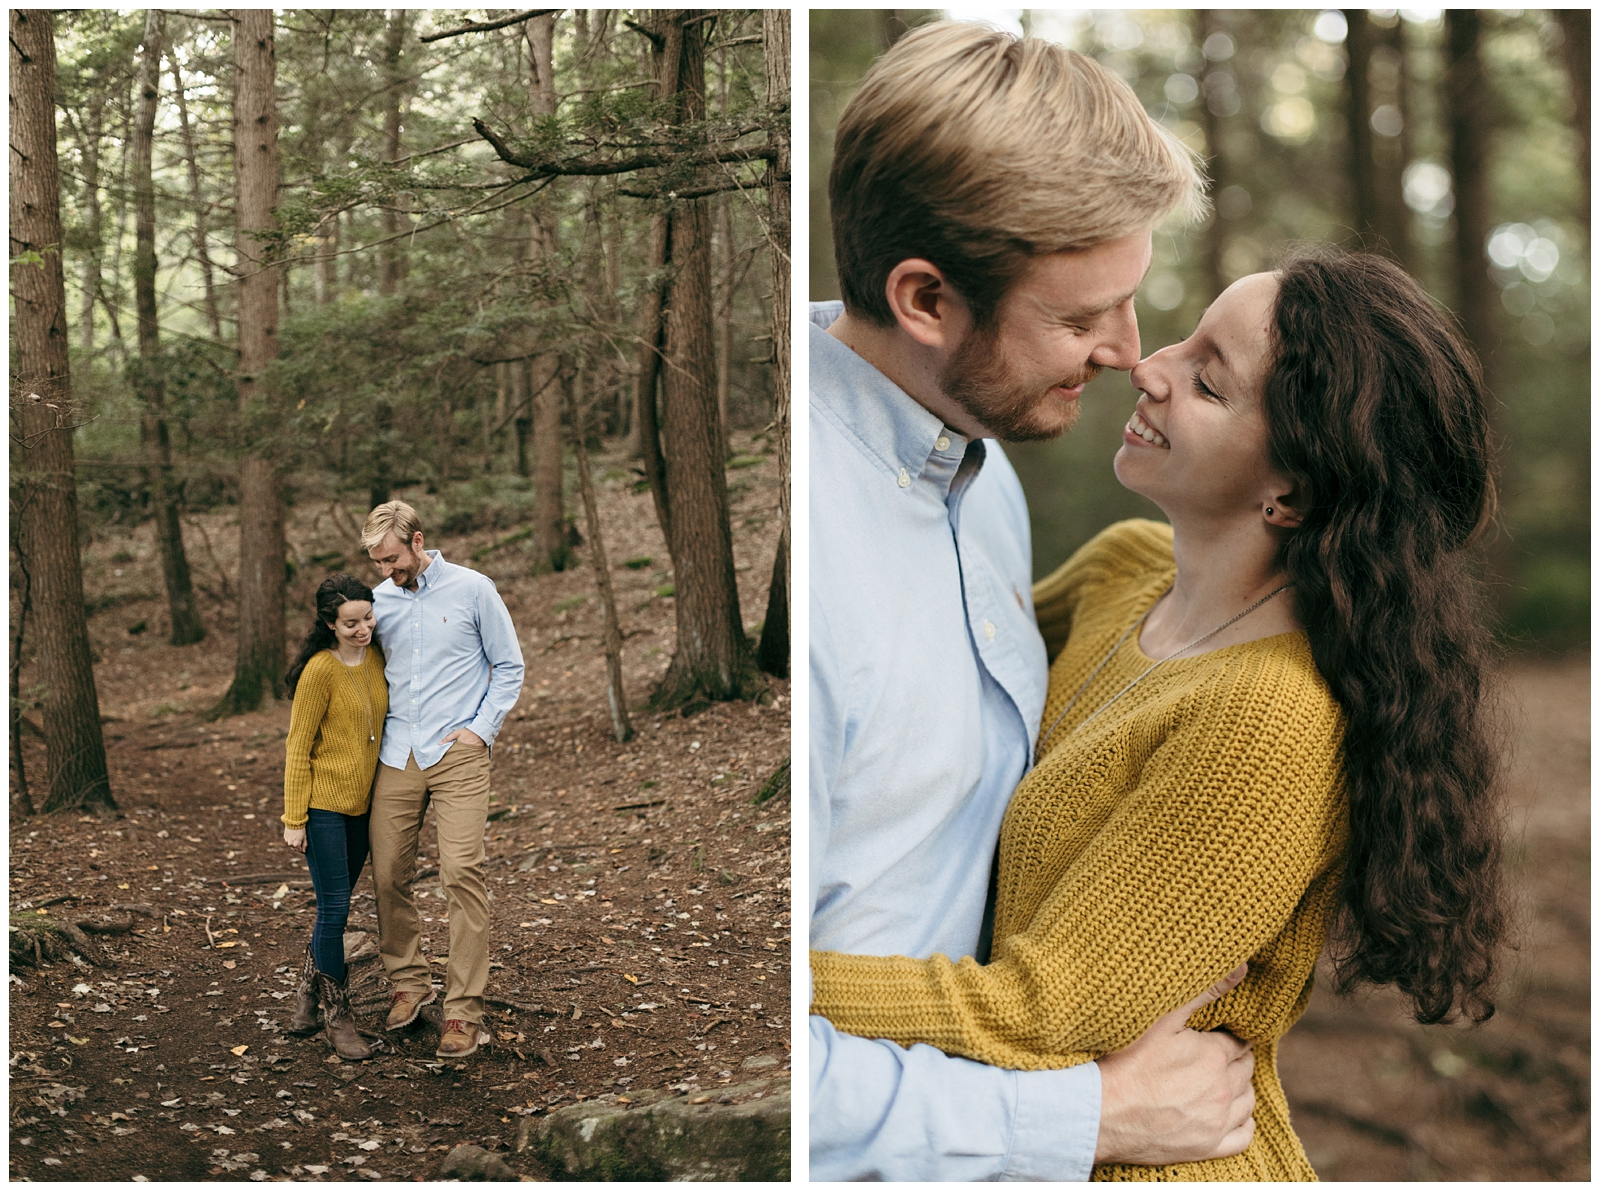 Connecticut-Engagement-Photographer-Bailey-Q-Photo-12.jpg